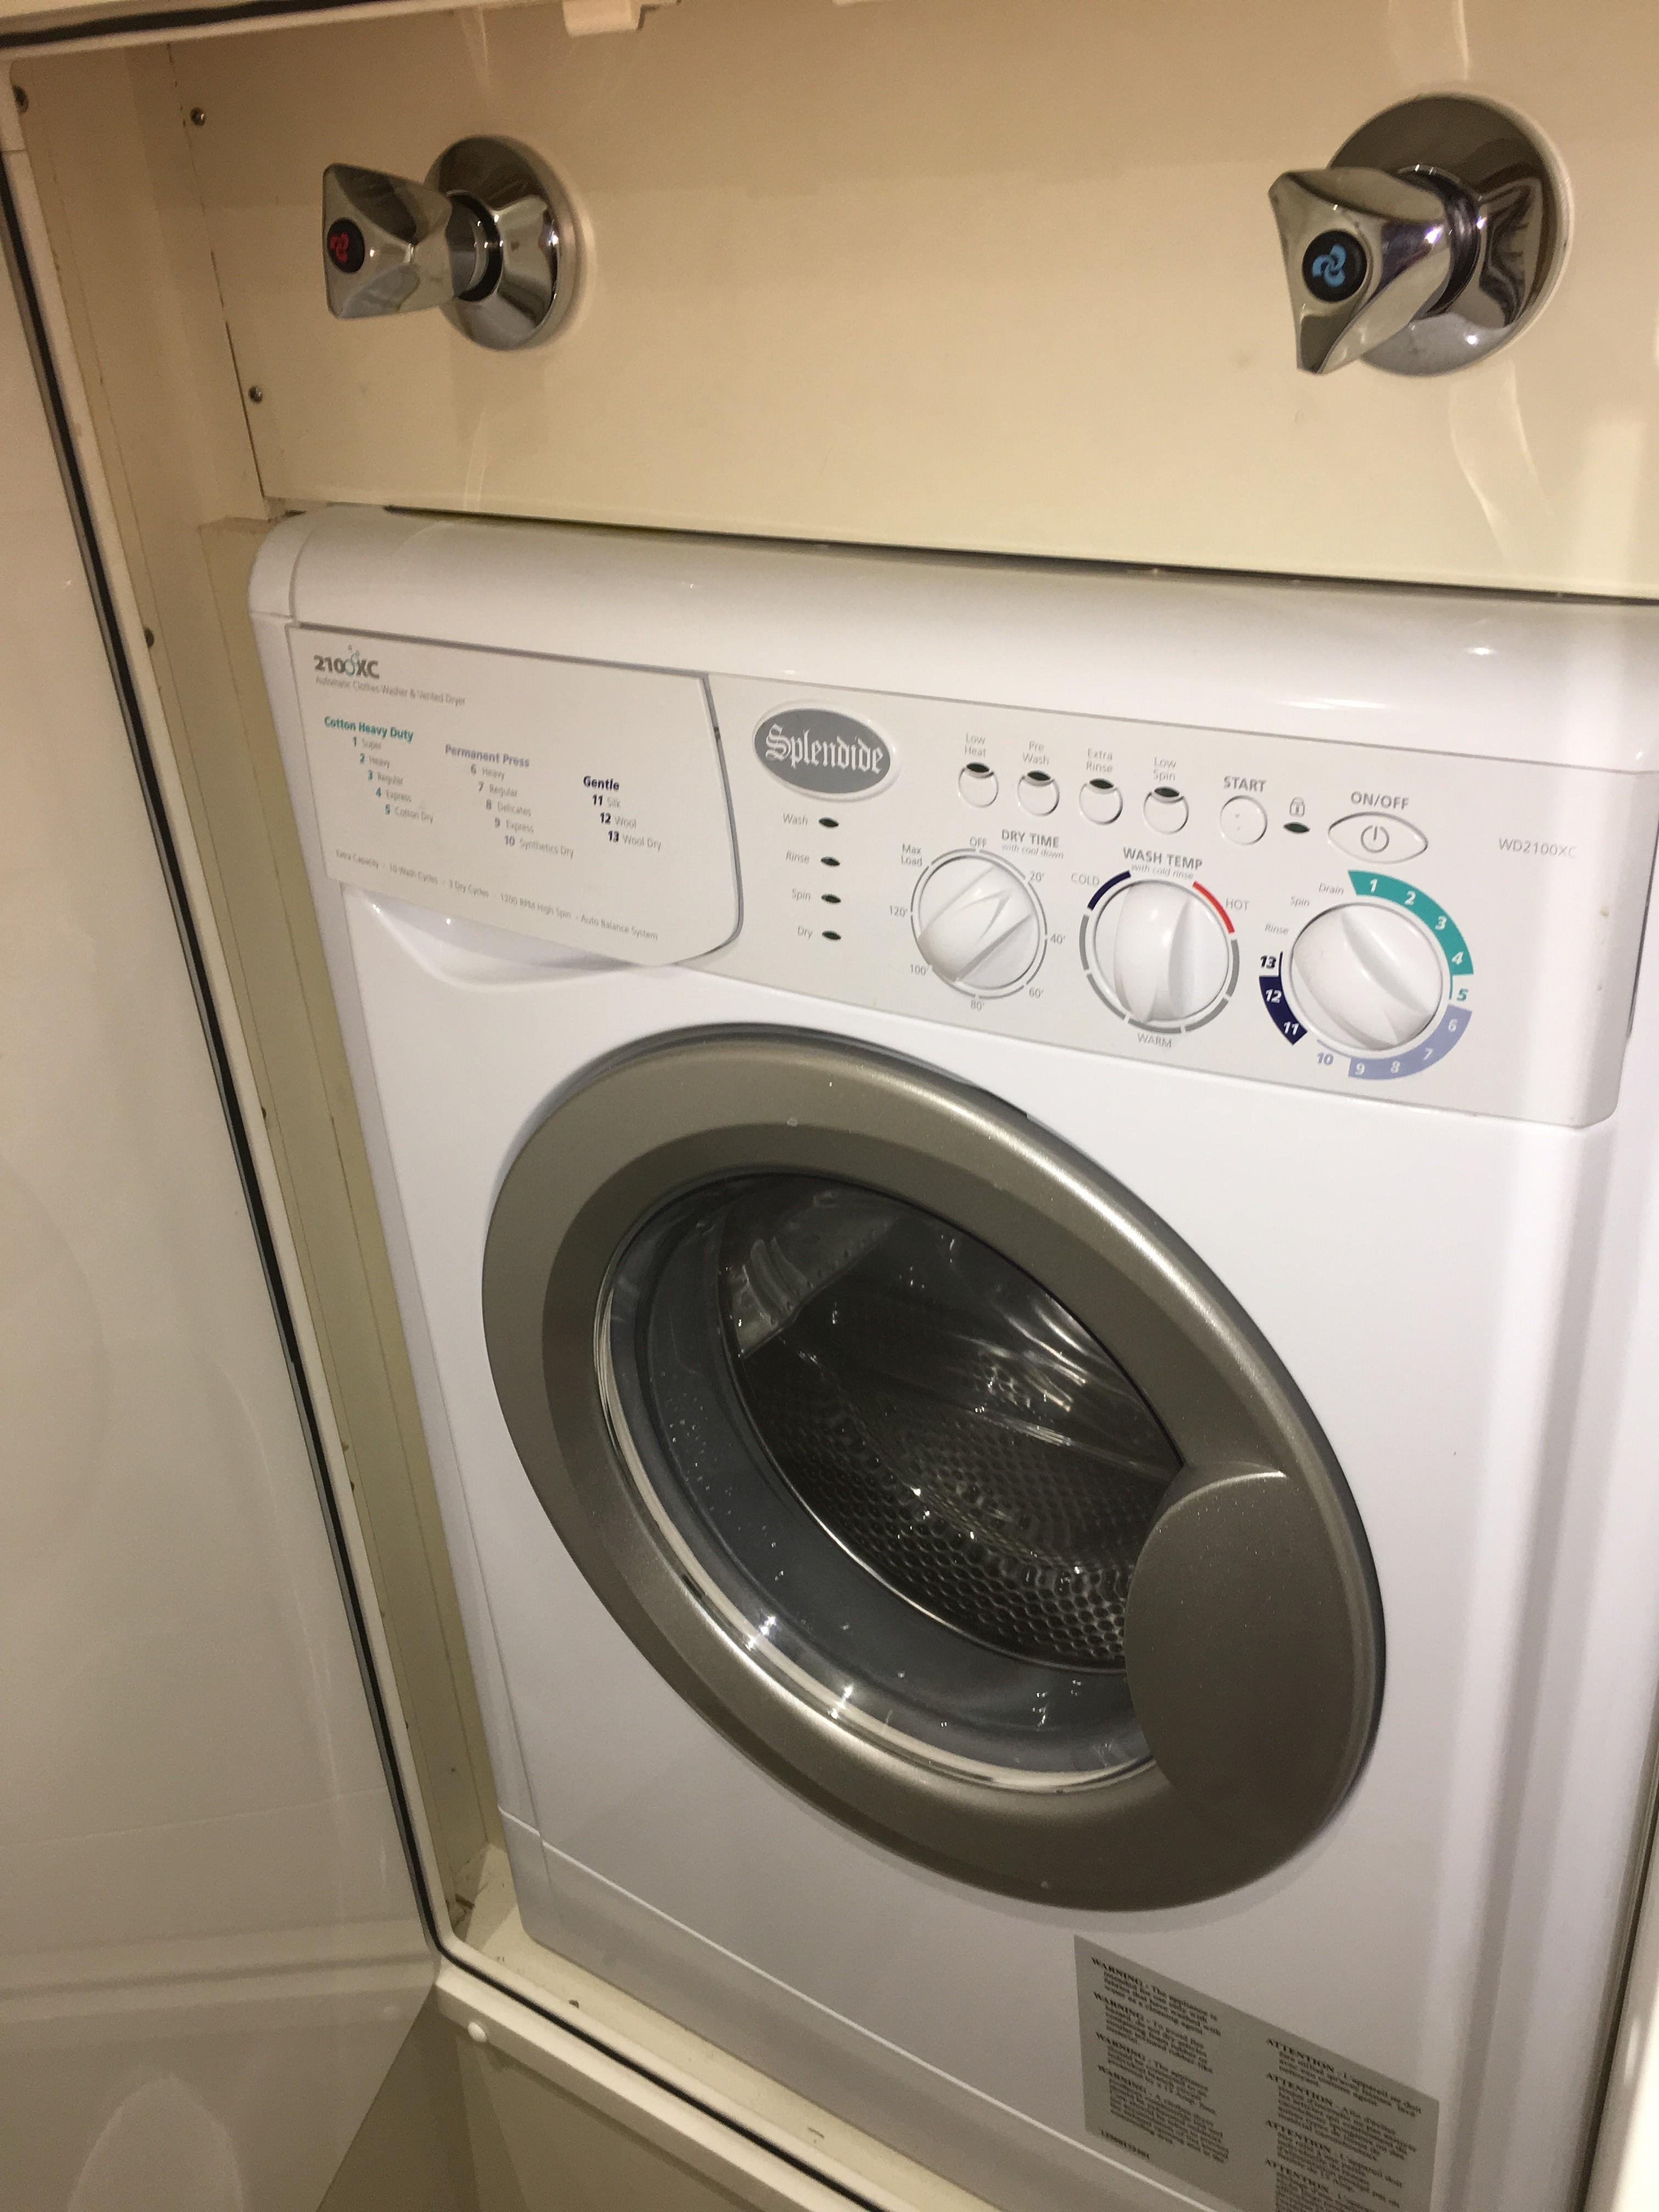 55 Grand Banks Laundry